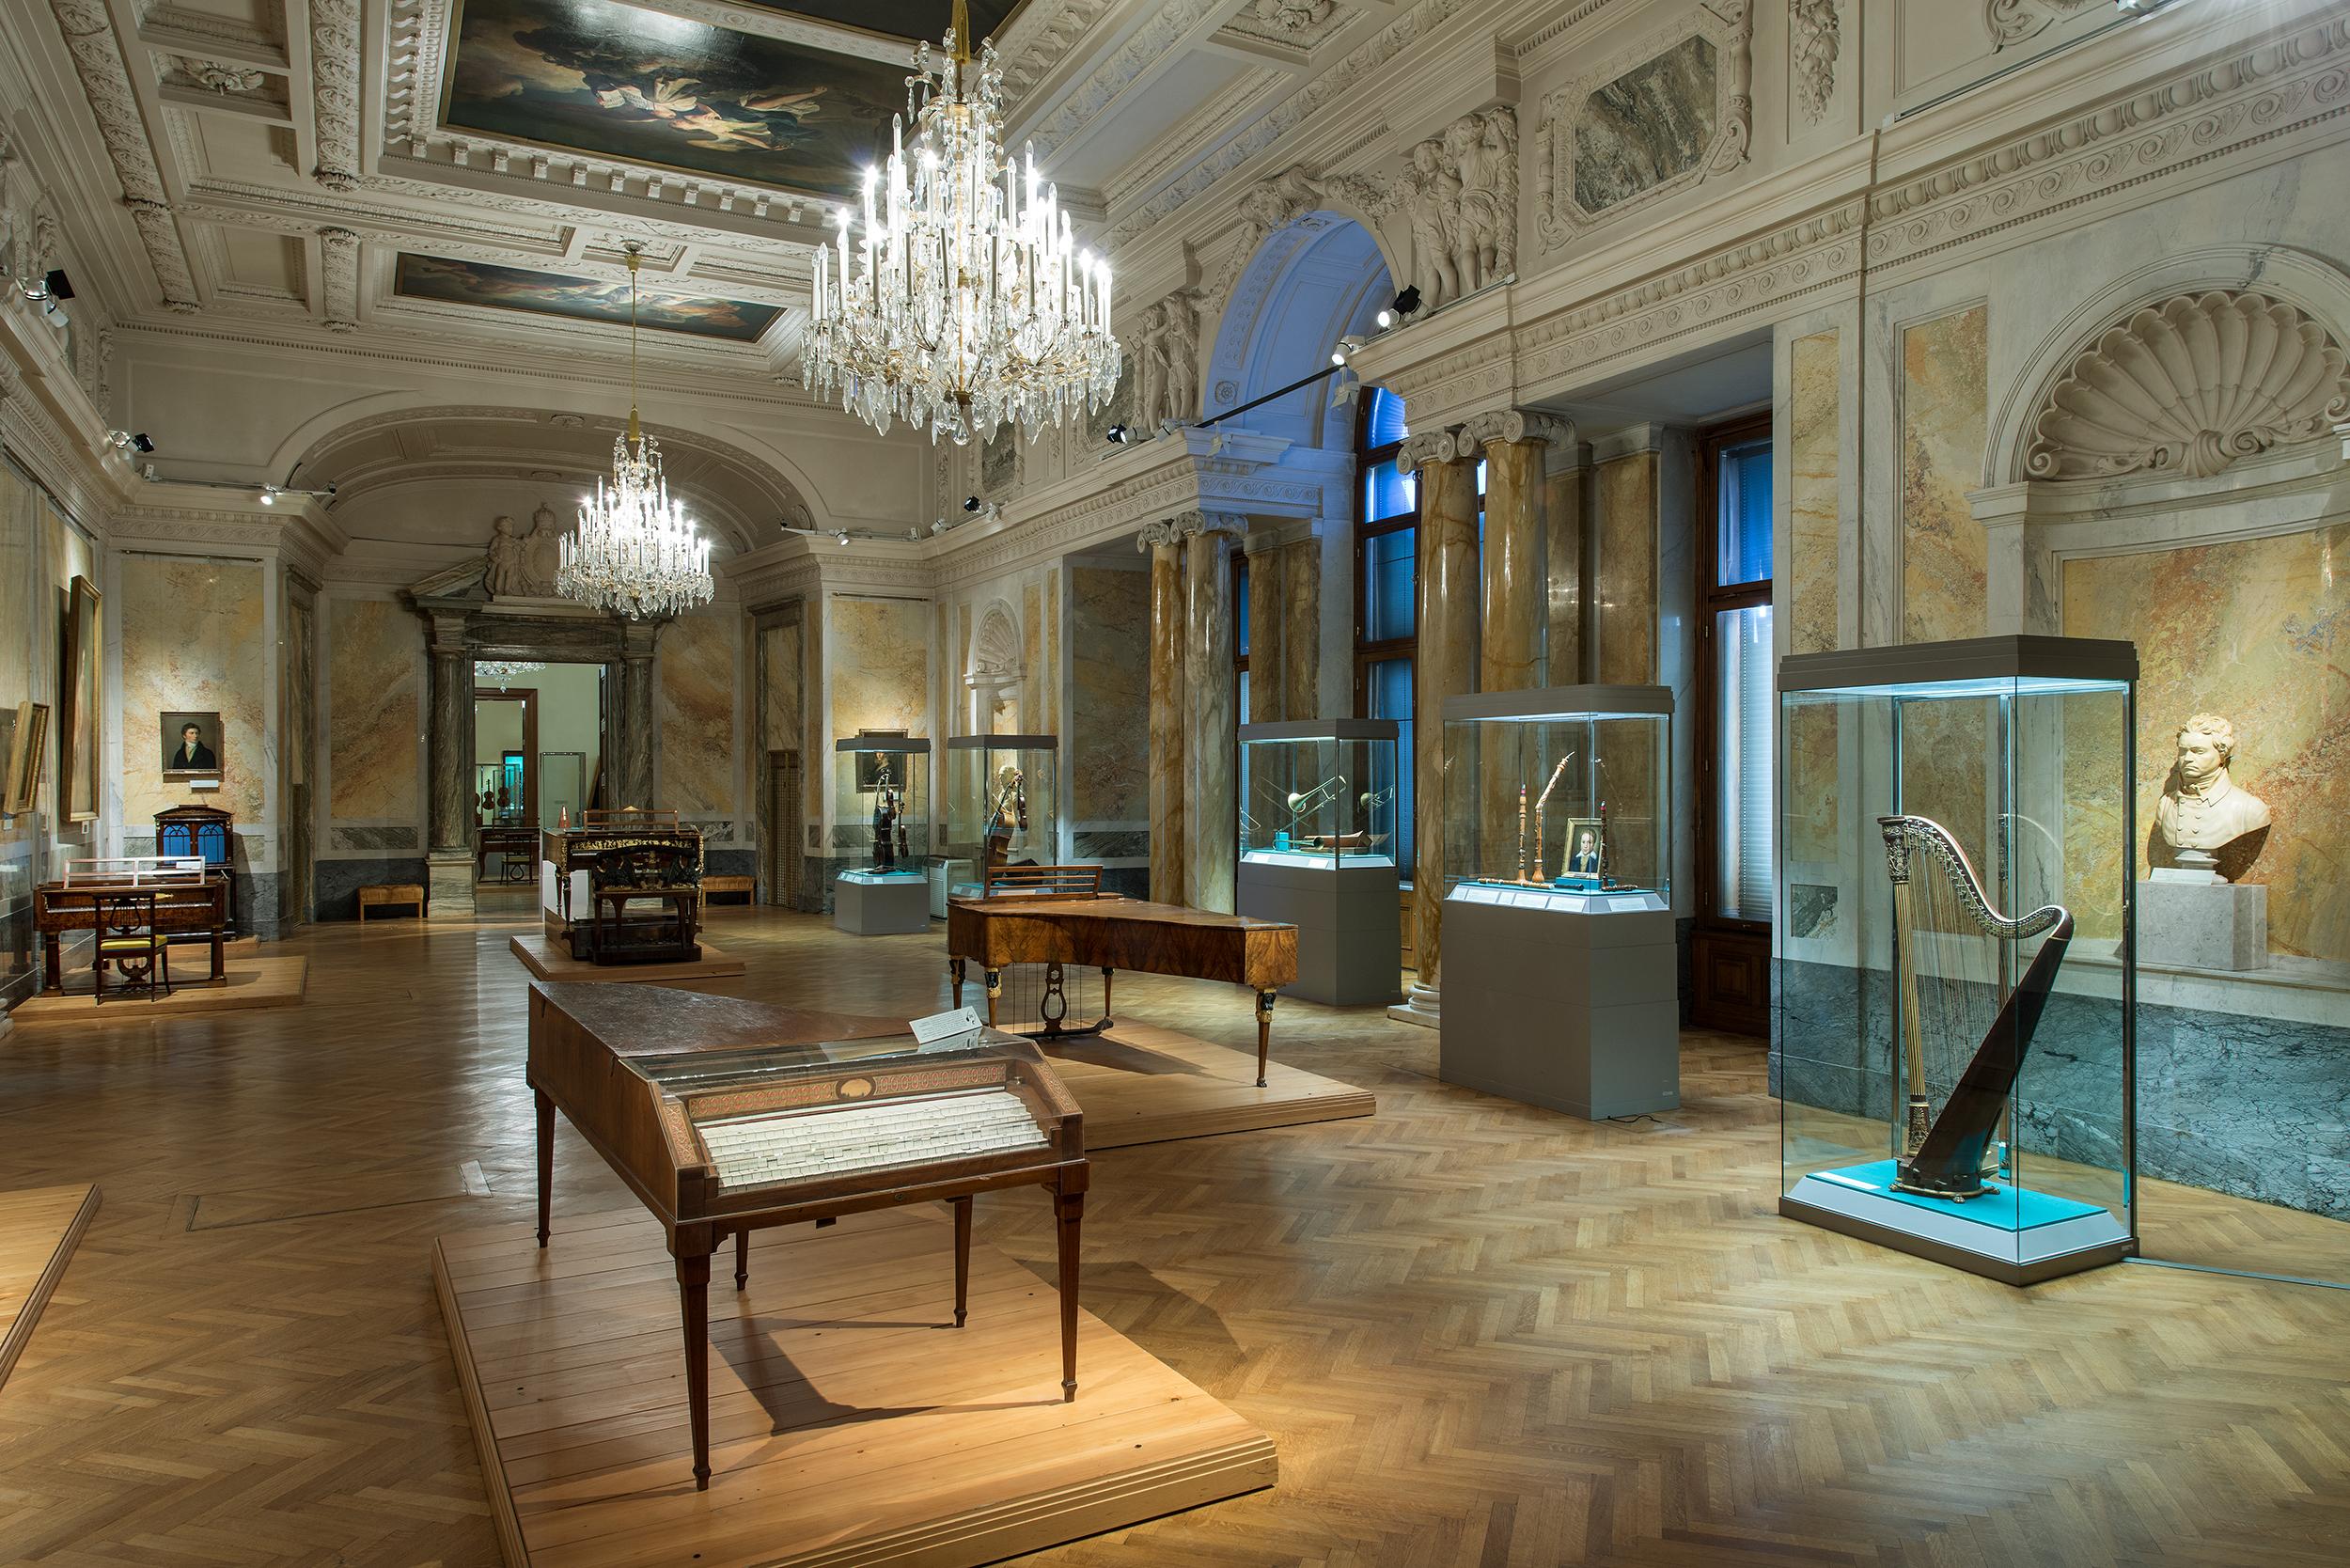 KHM-Museumsverband. Marmorsaal der Sammlung alter Musikinstrumente, 2013